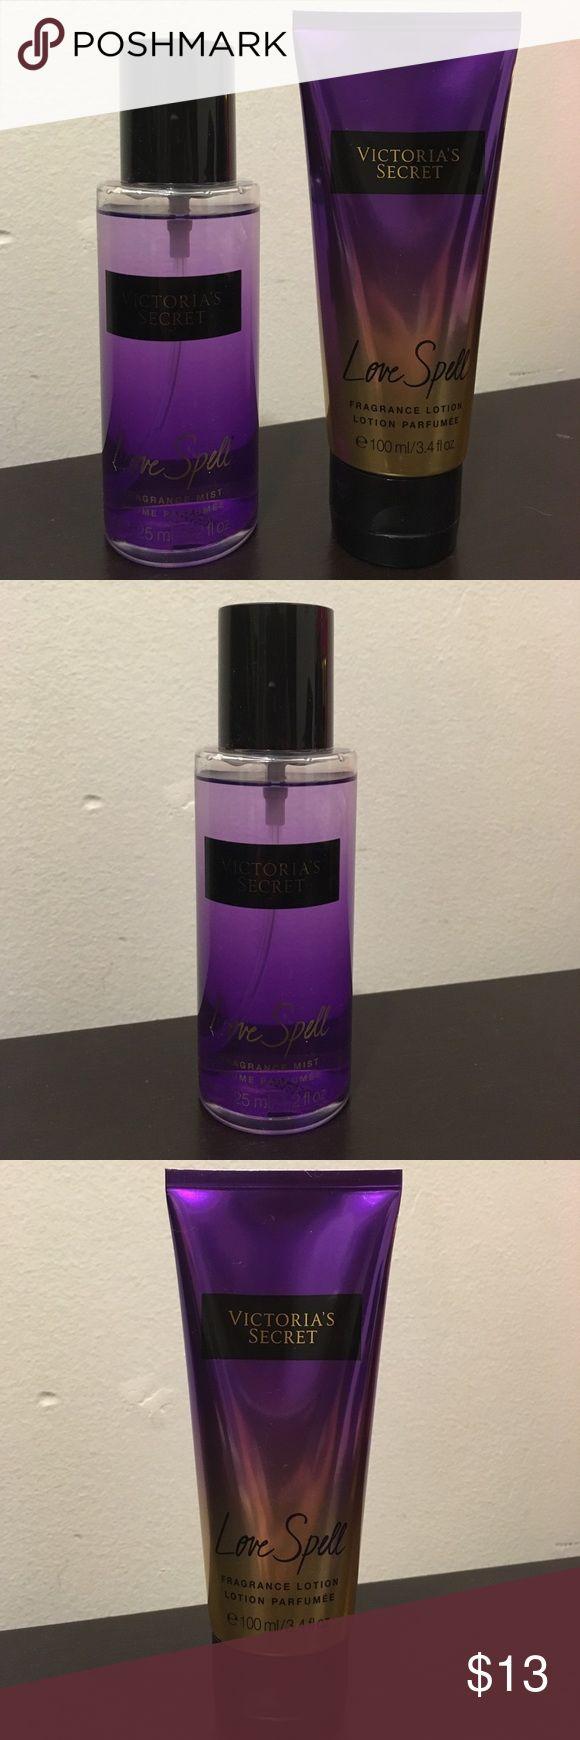 Victoria's Secret body spray set - love spell Love spell body spray set by Victoria's Secret Victoria's Secret Other